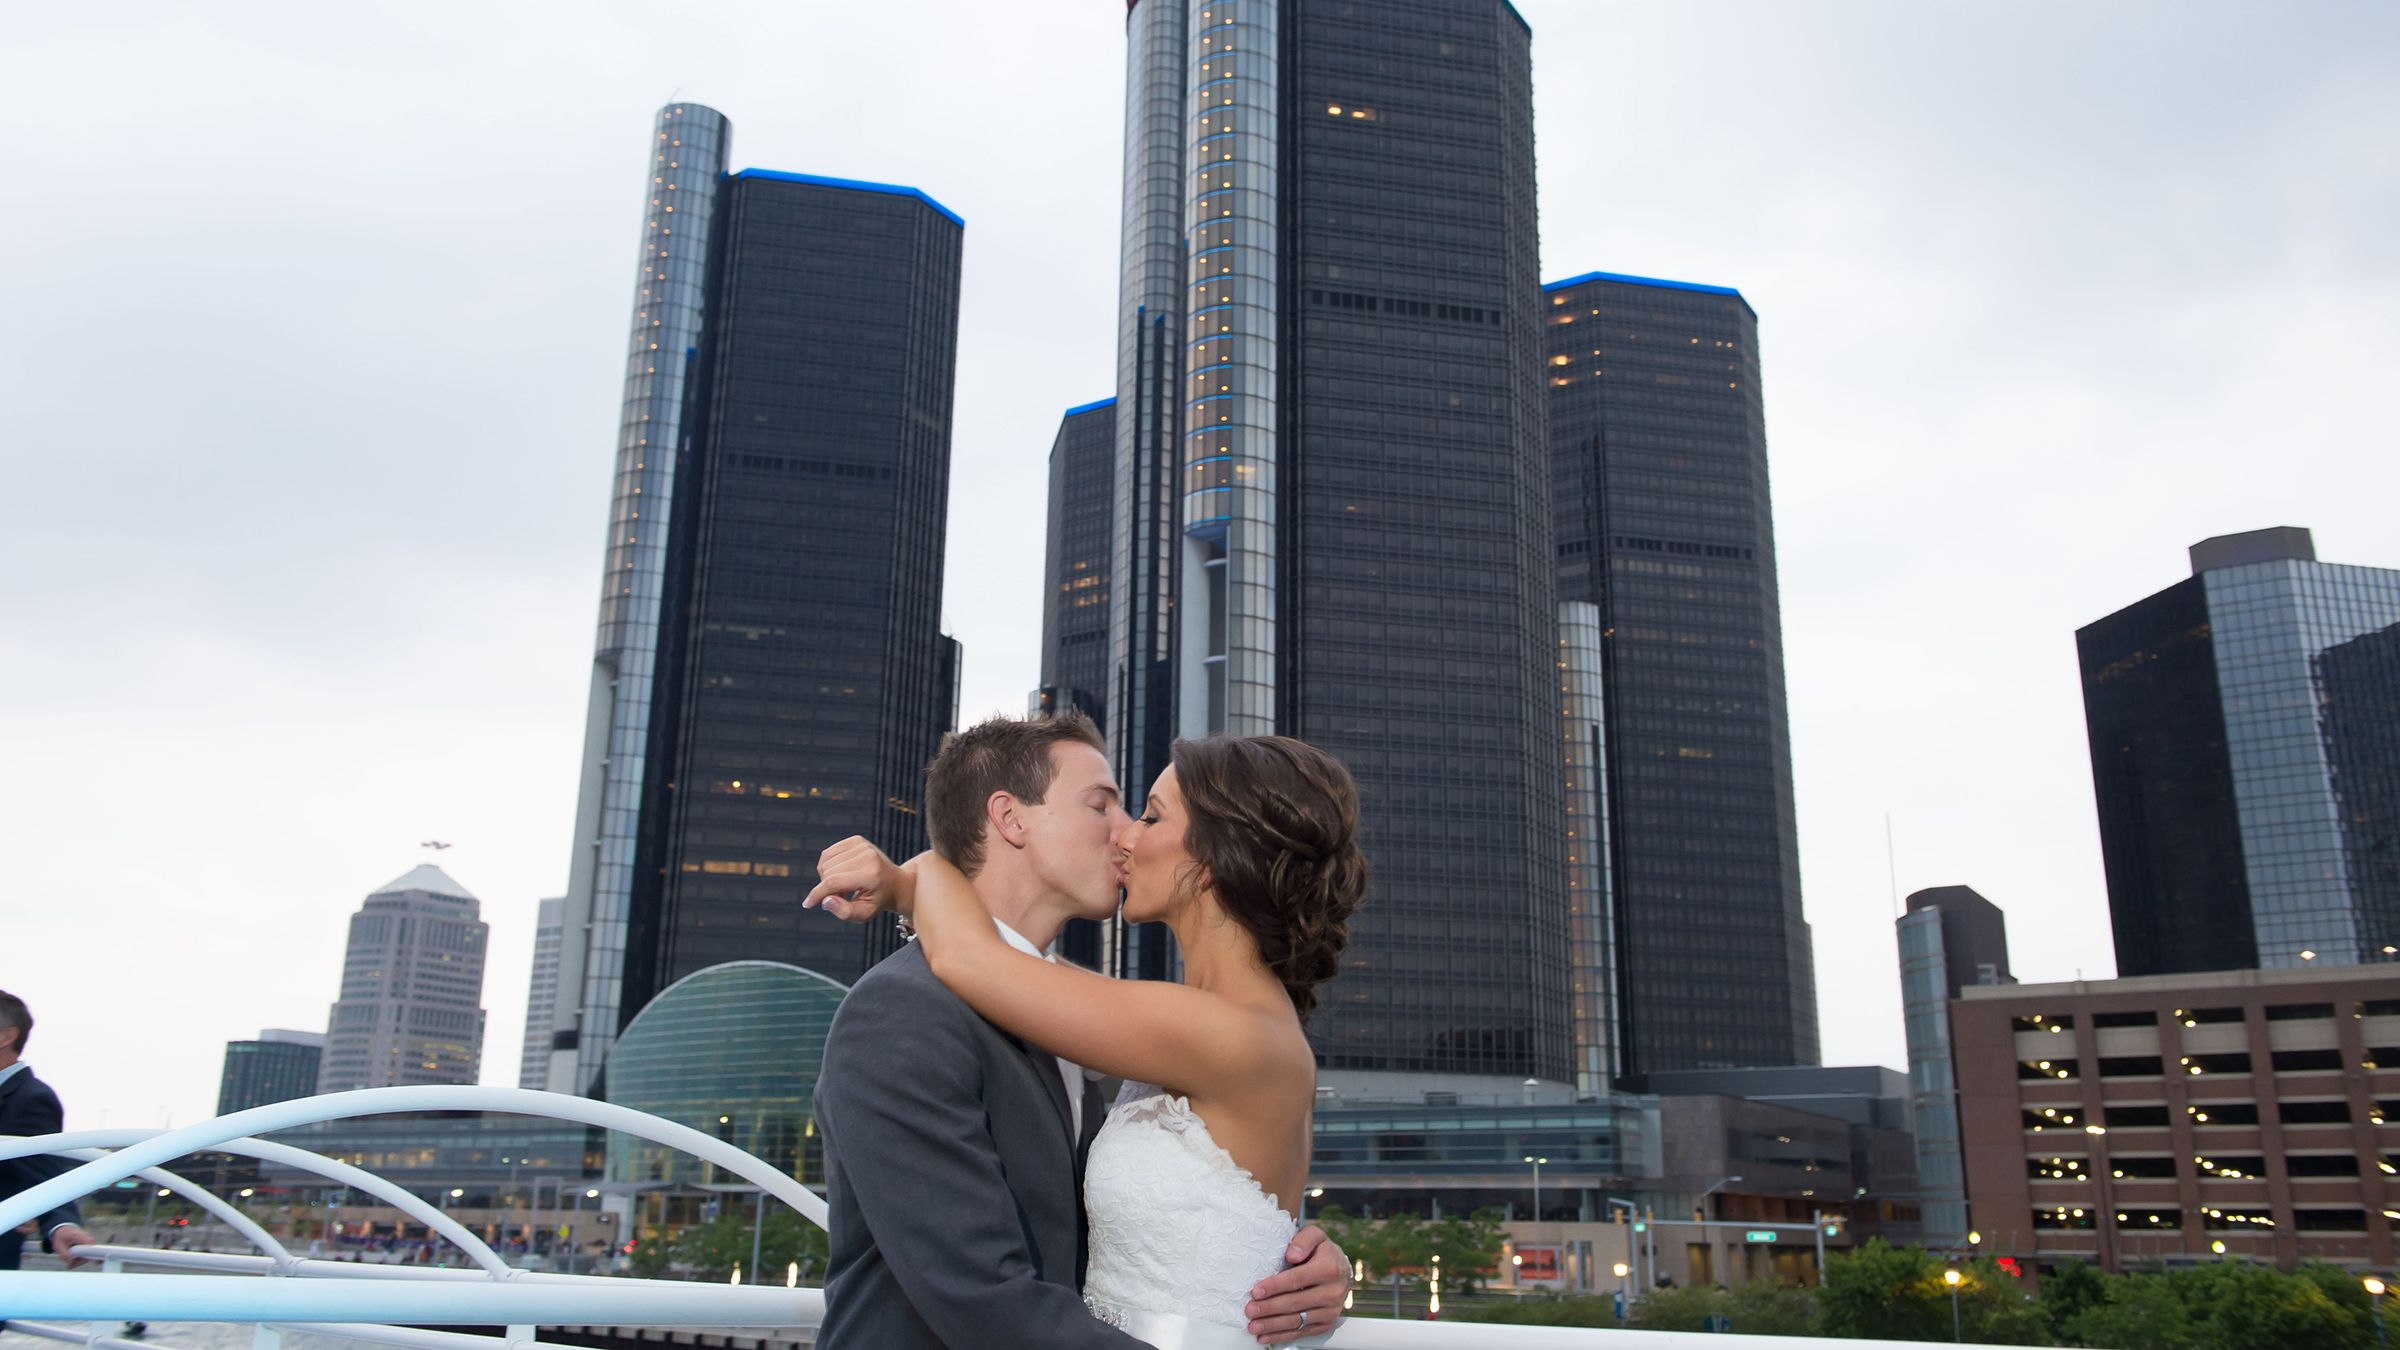 Wedding Venue In Detroit Michigan - Infintiy & Ovation ...